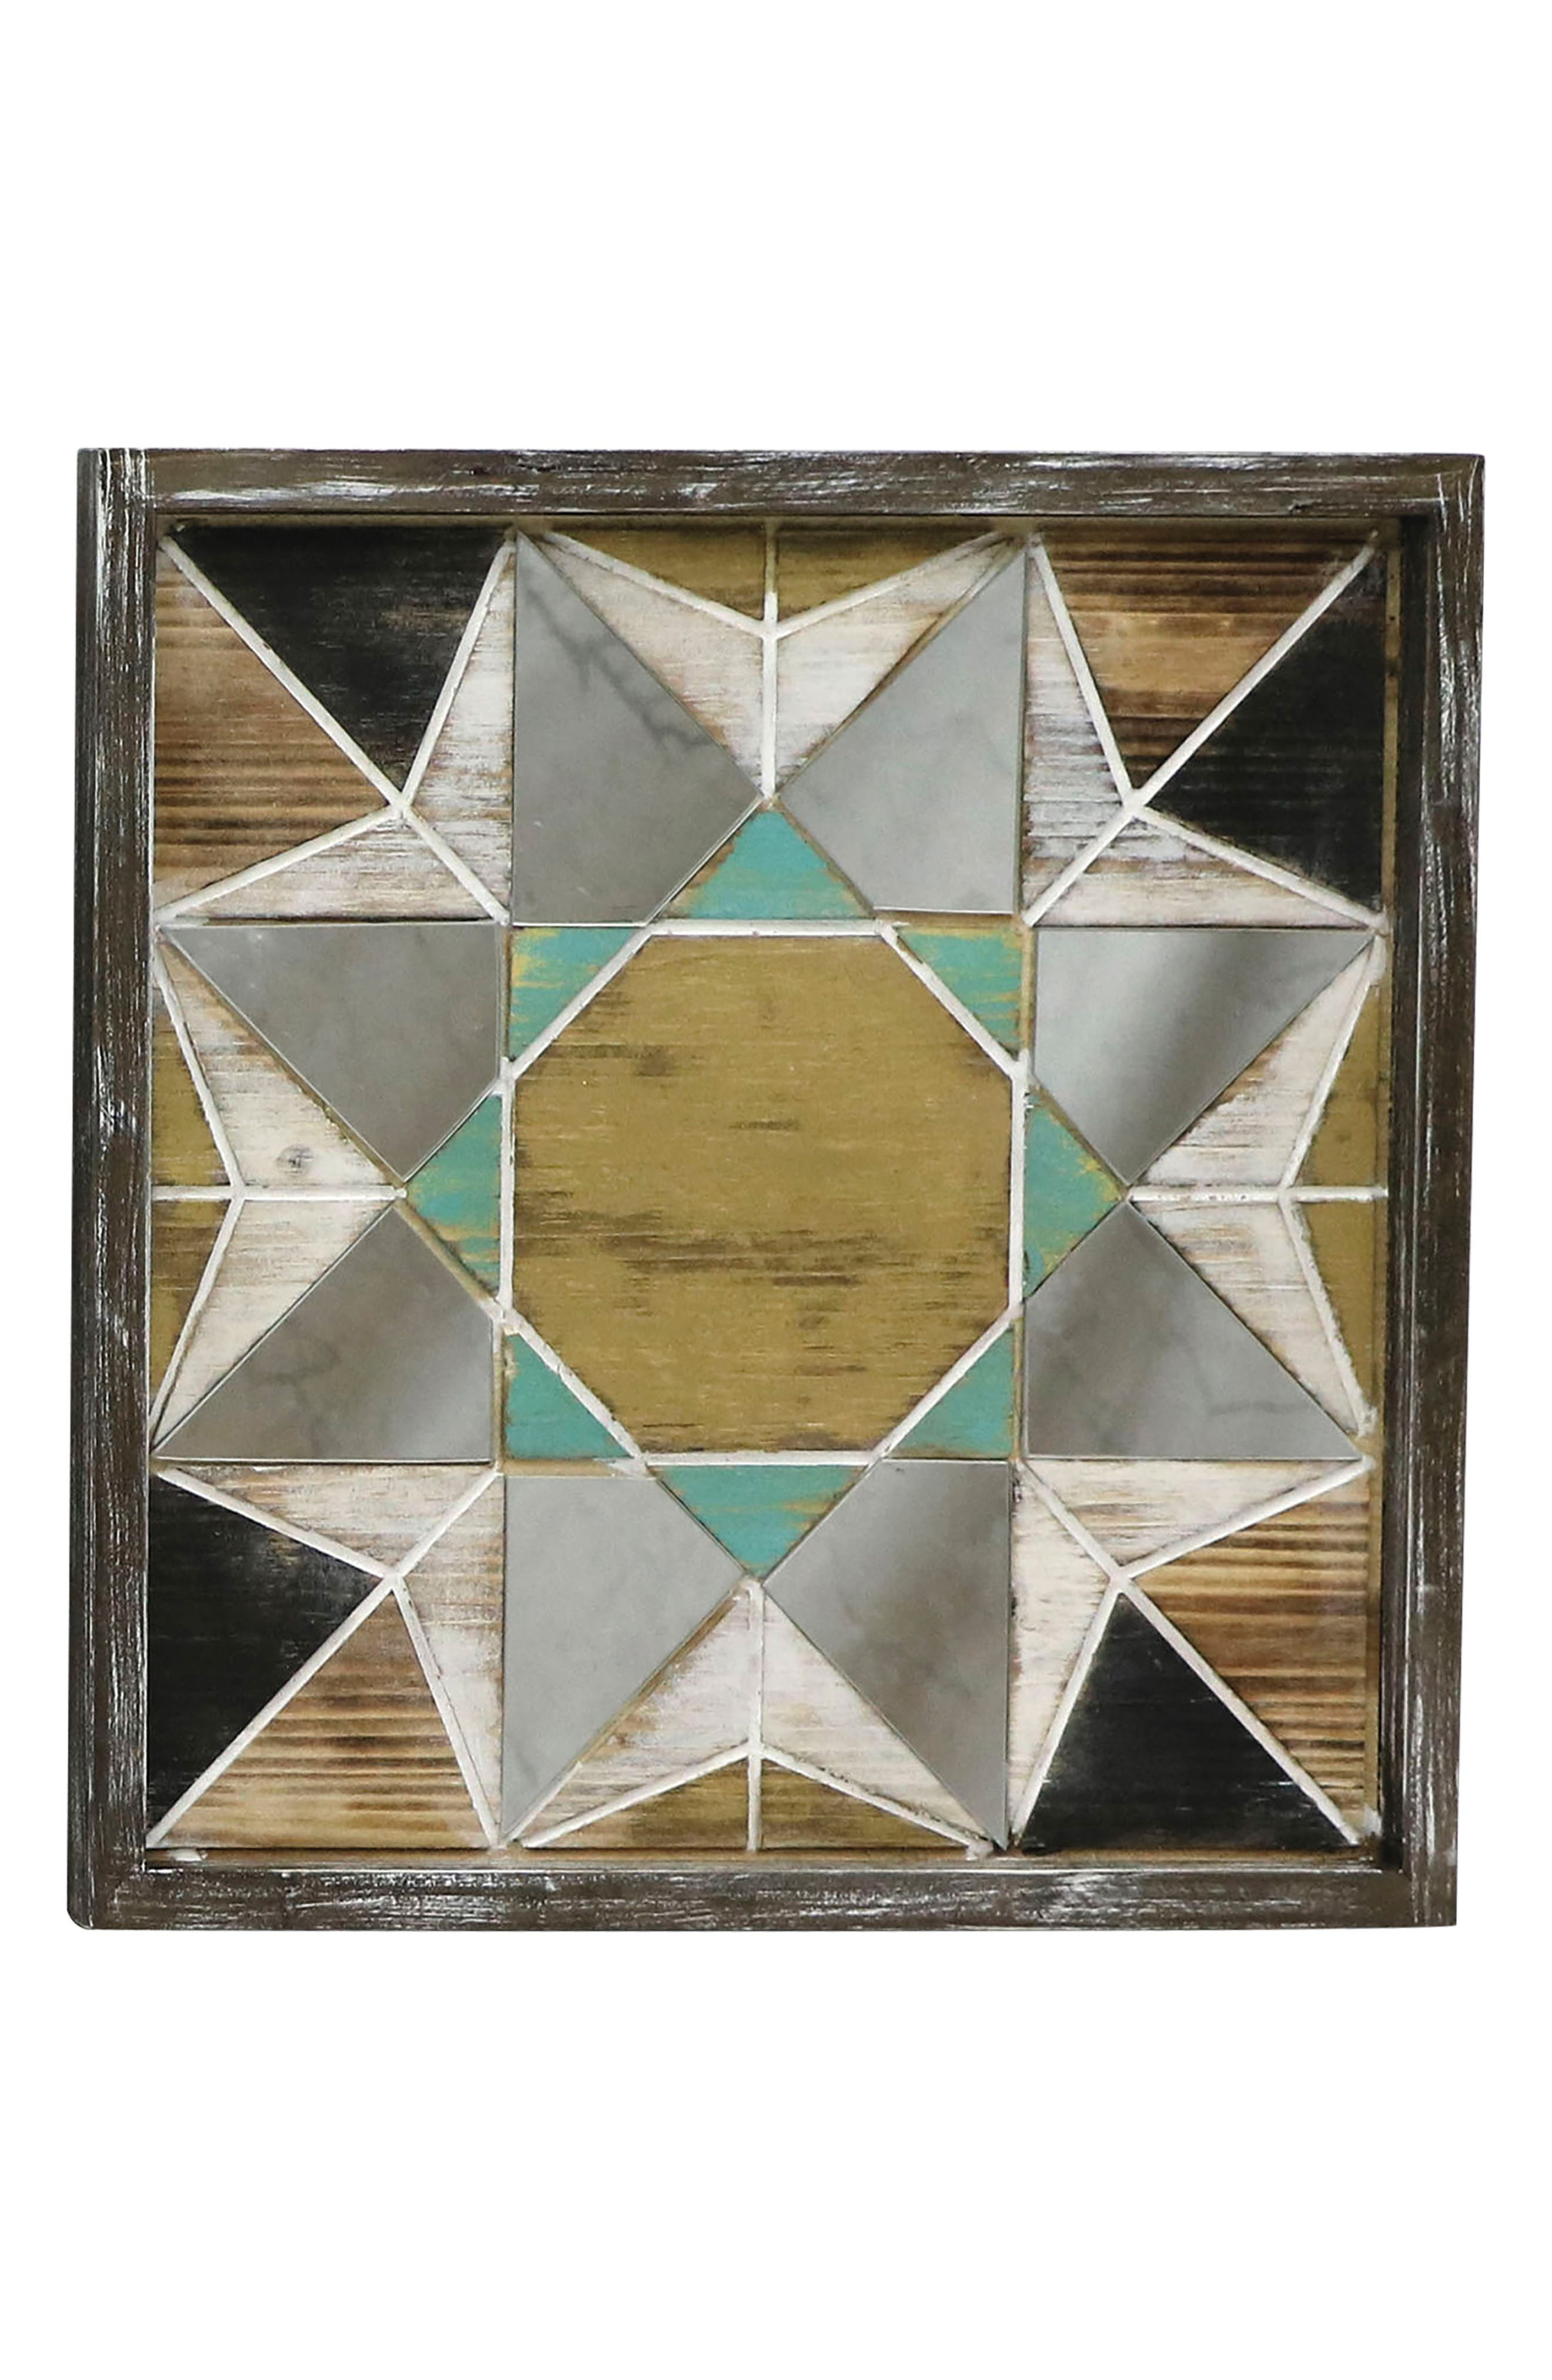 Alternate Image 1 Selected - Foreside Sunburst Mosaic Wall Art